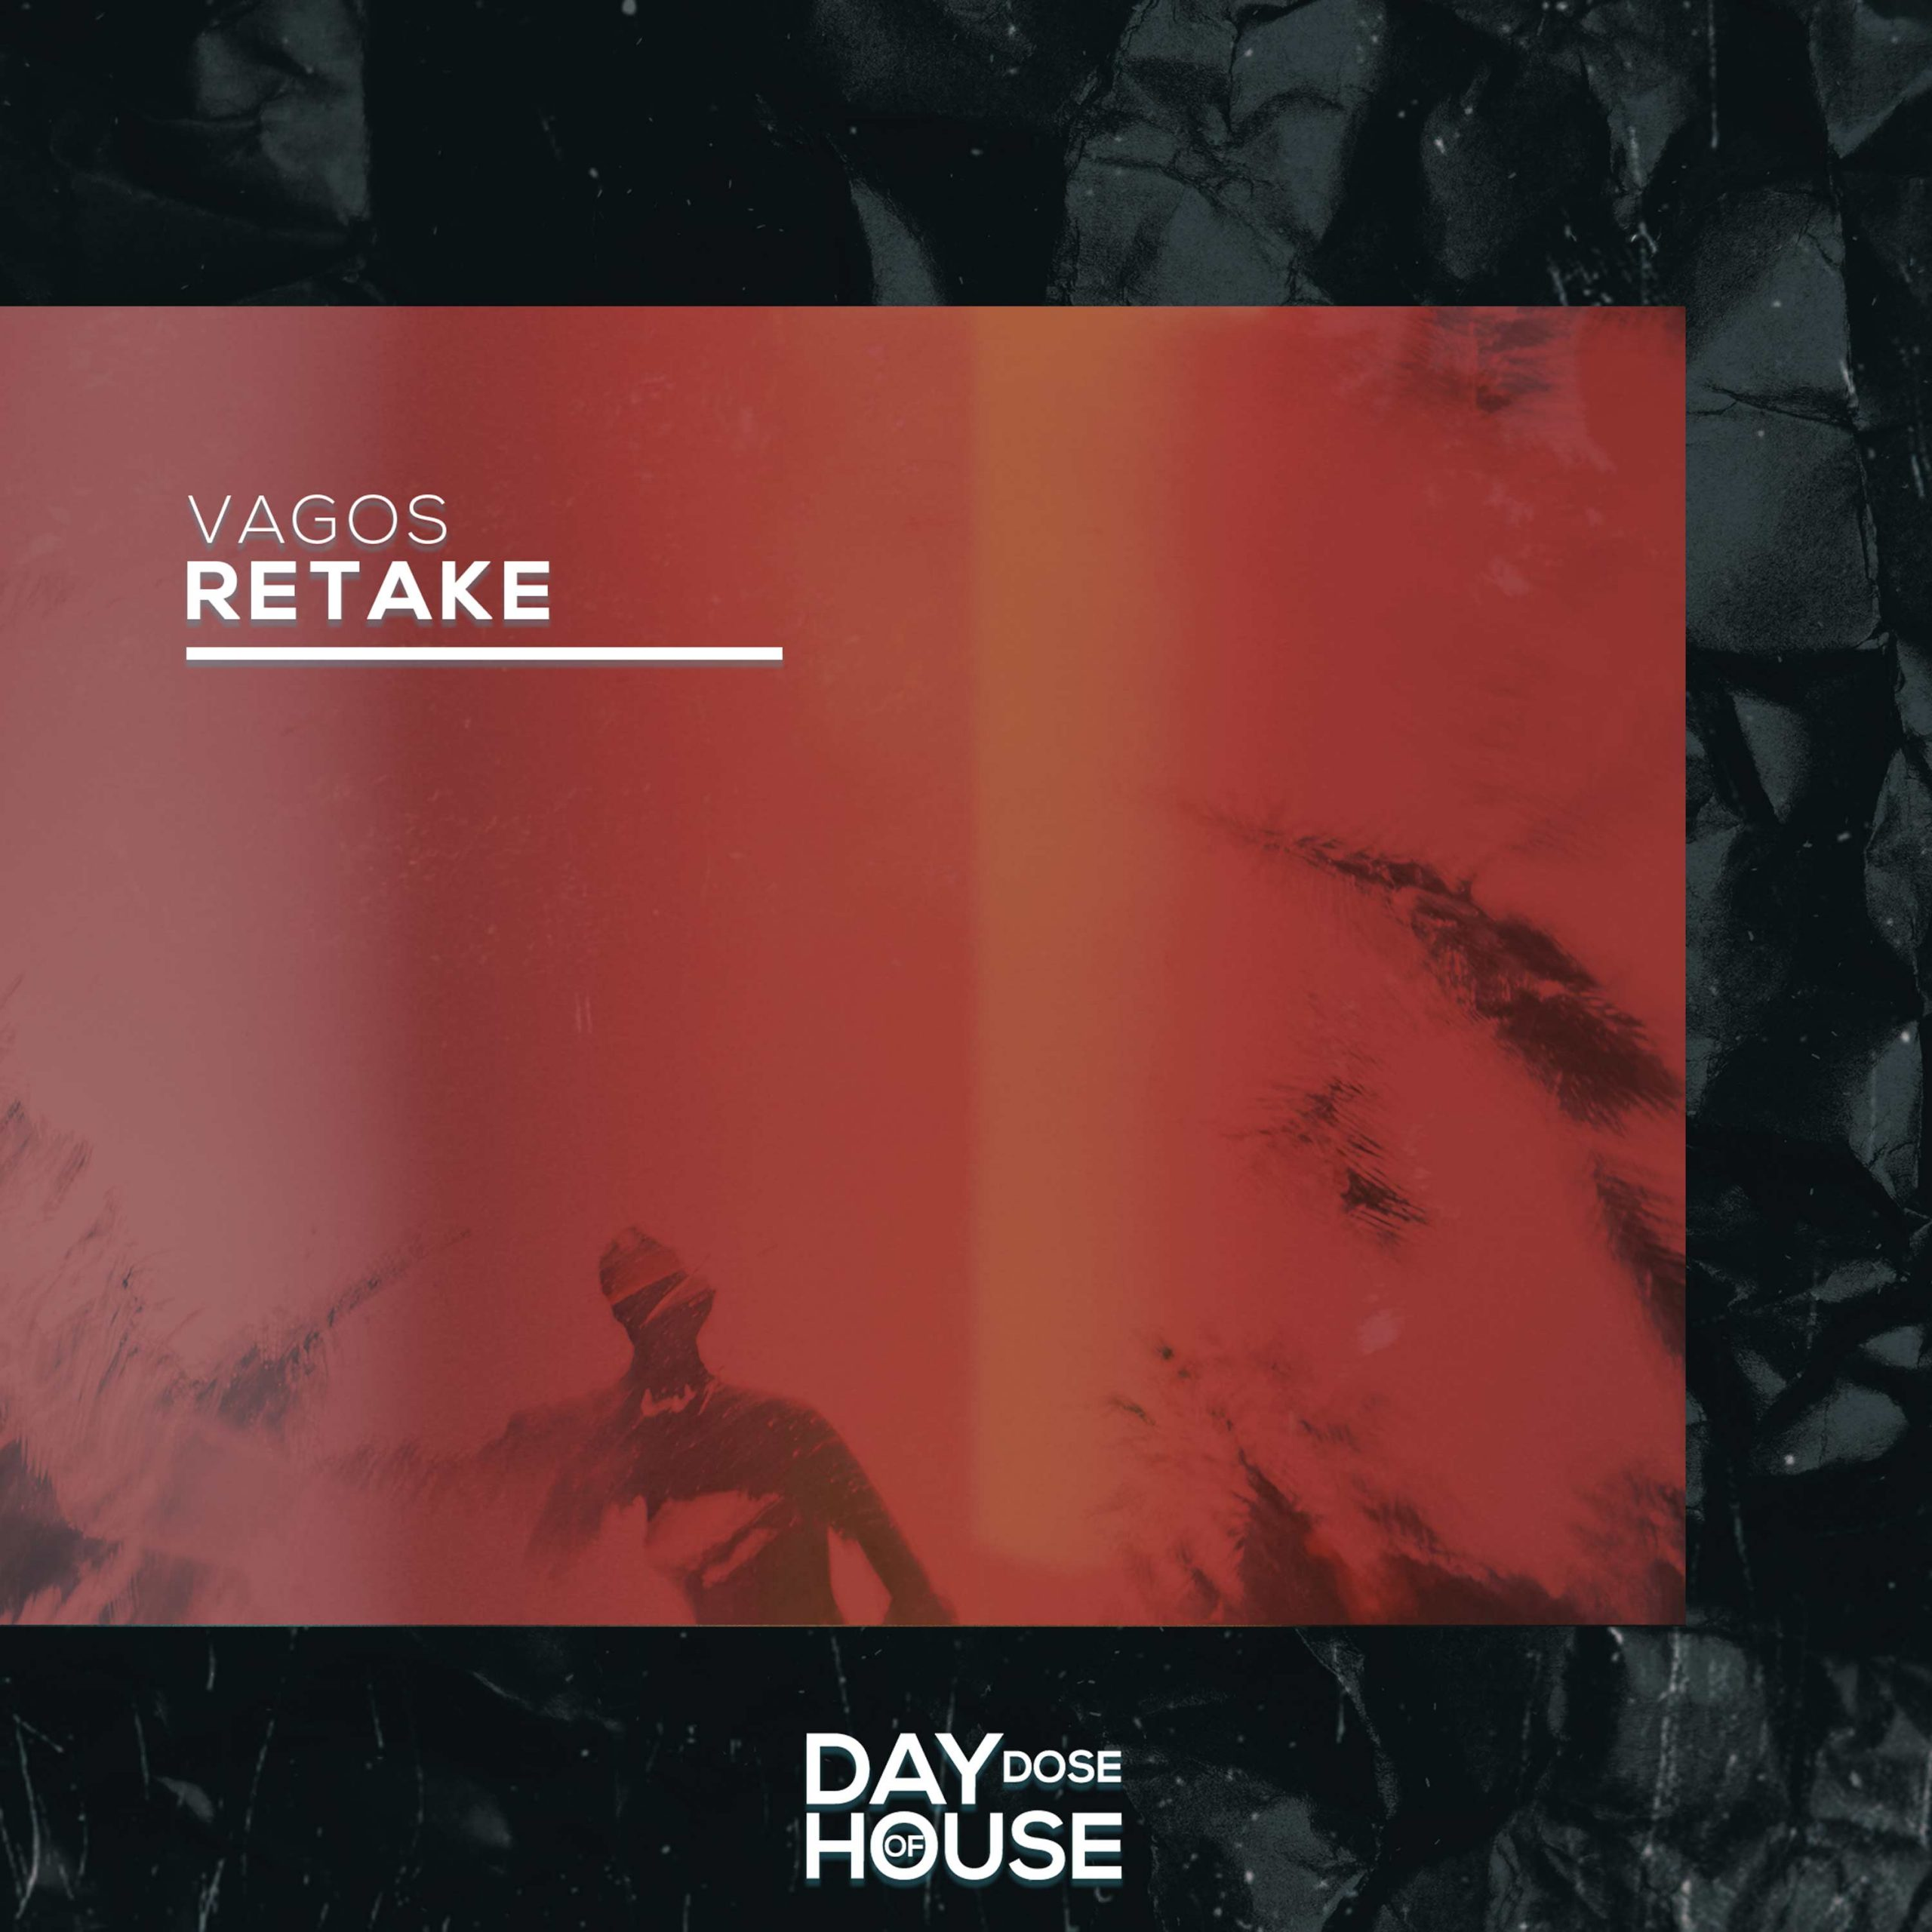 Vagos - Retake